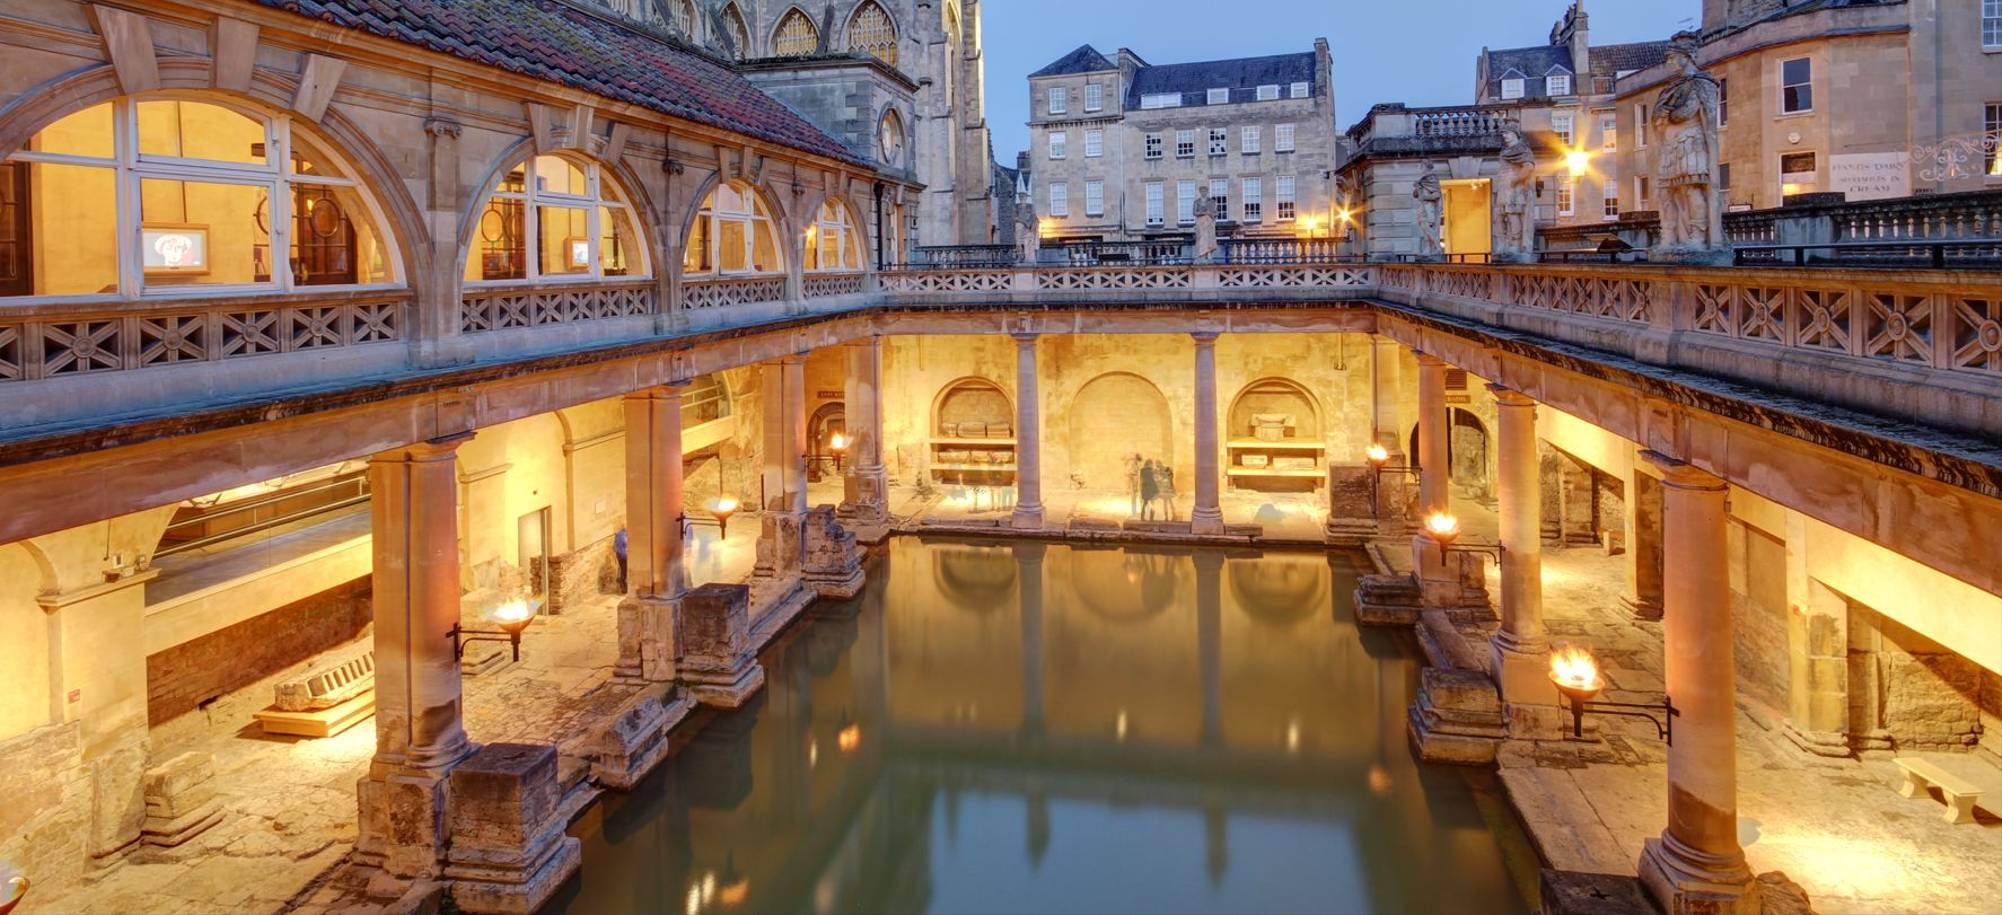 Bath 2 - Itinerary Desktop.jpg